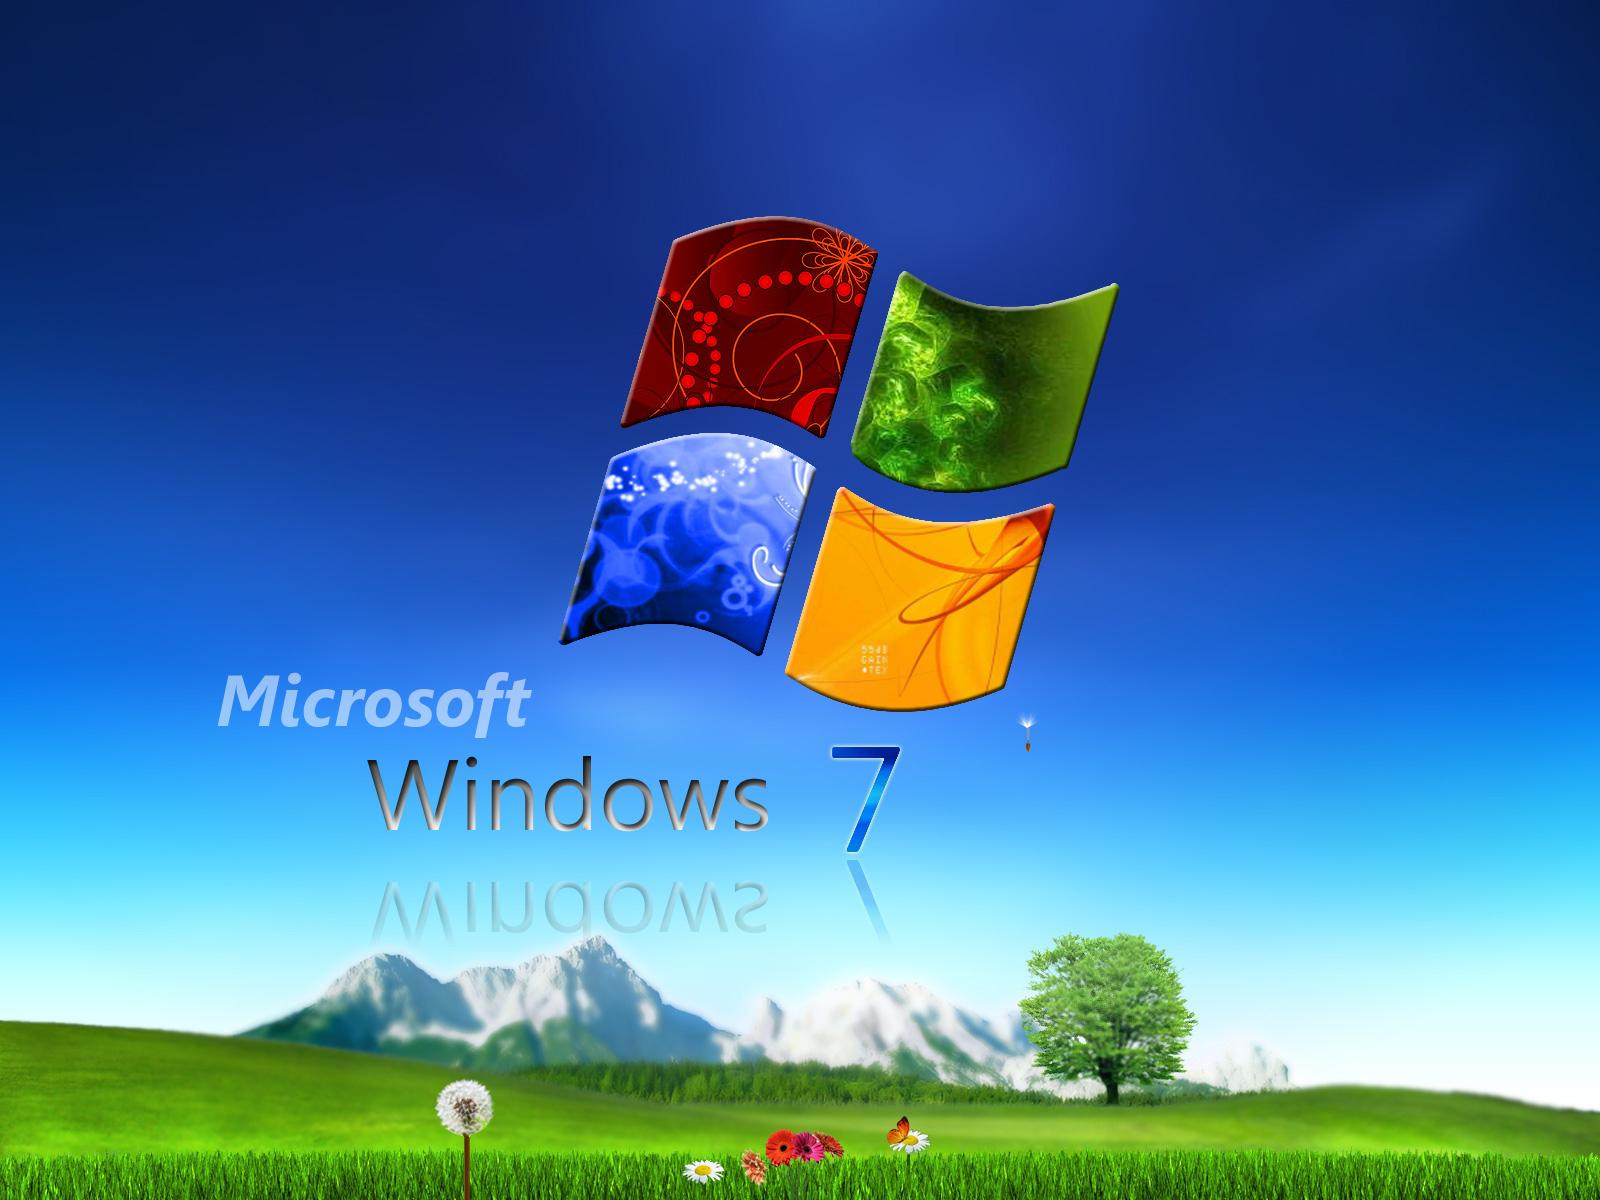 Free HD Wallpaper Of Windows 7 HD Wallpapers